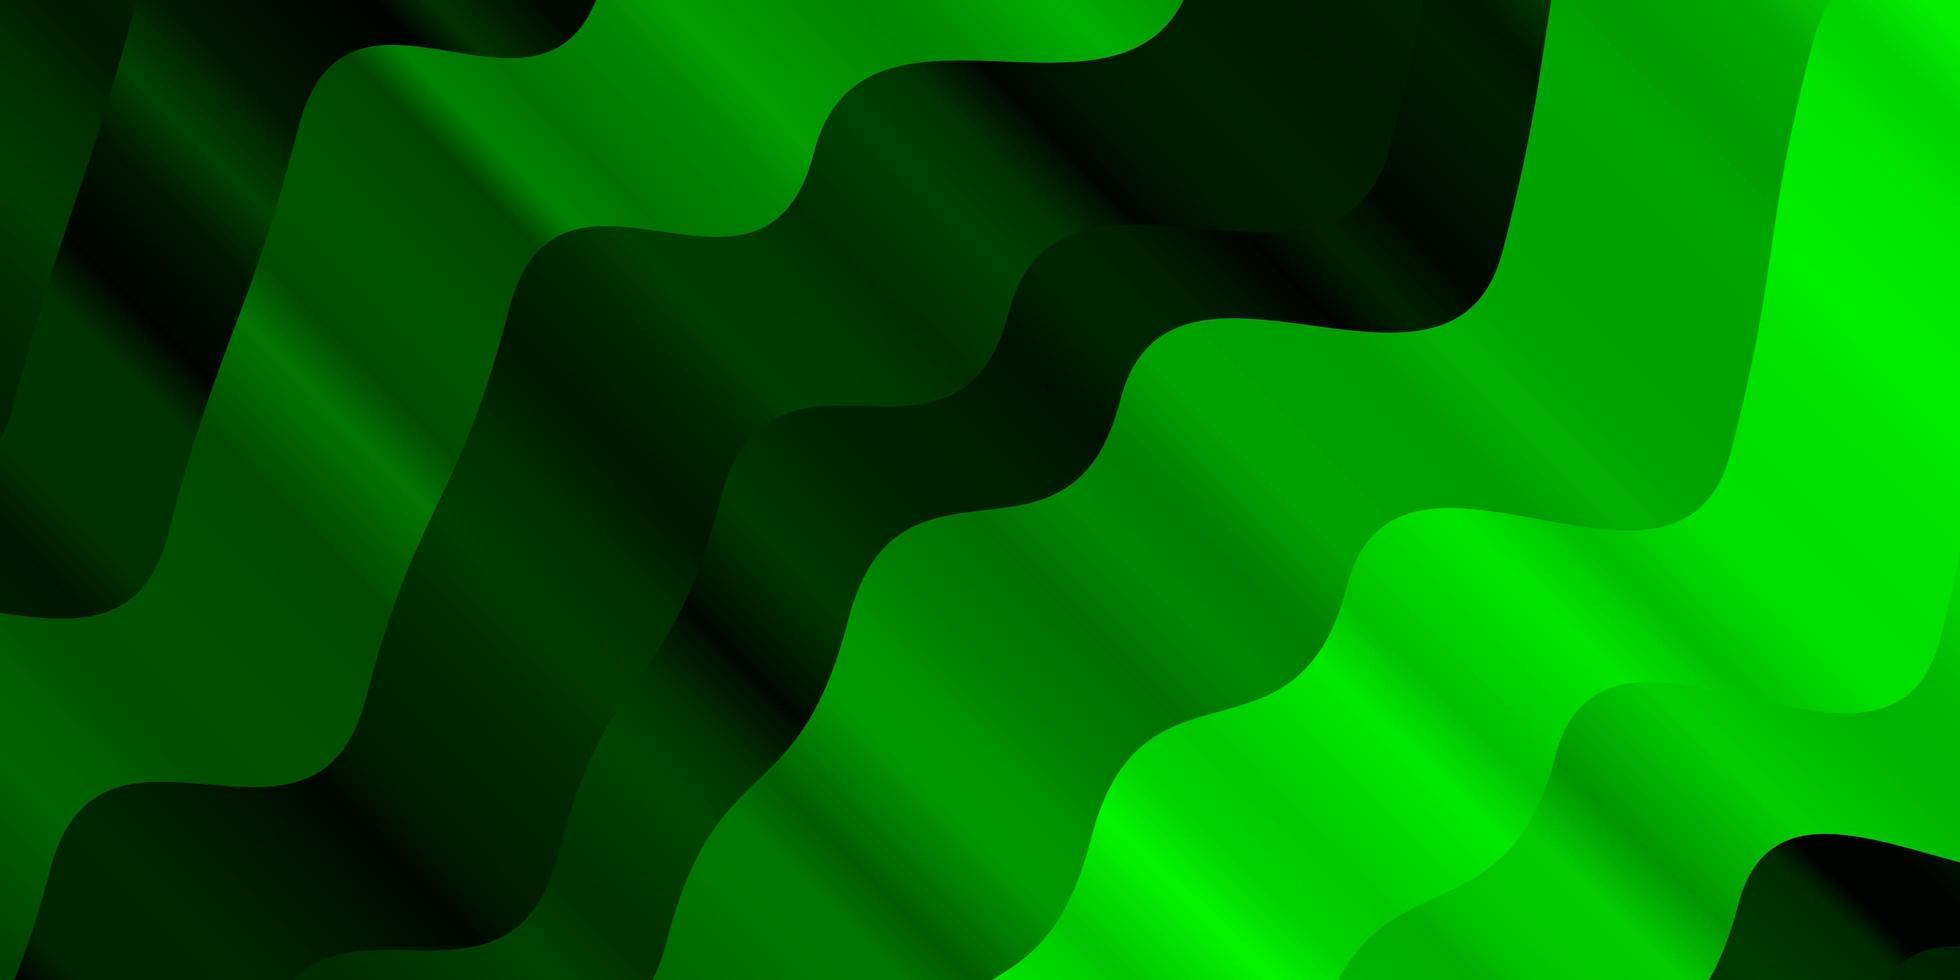 layout verde claro com curvas. vetor